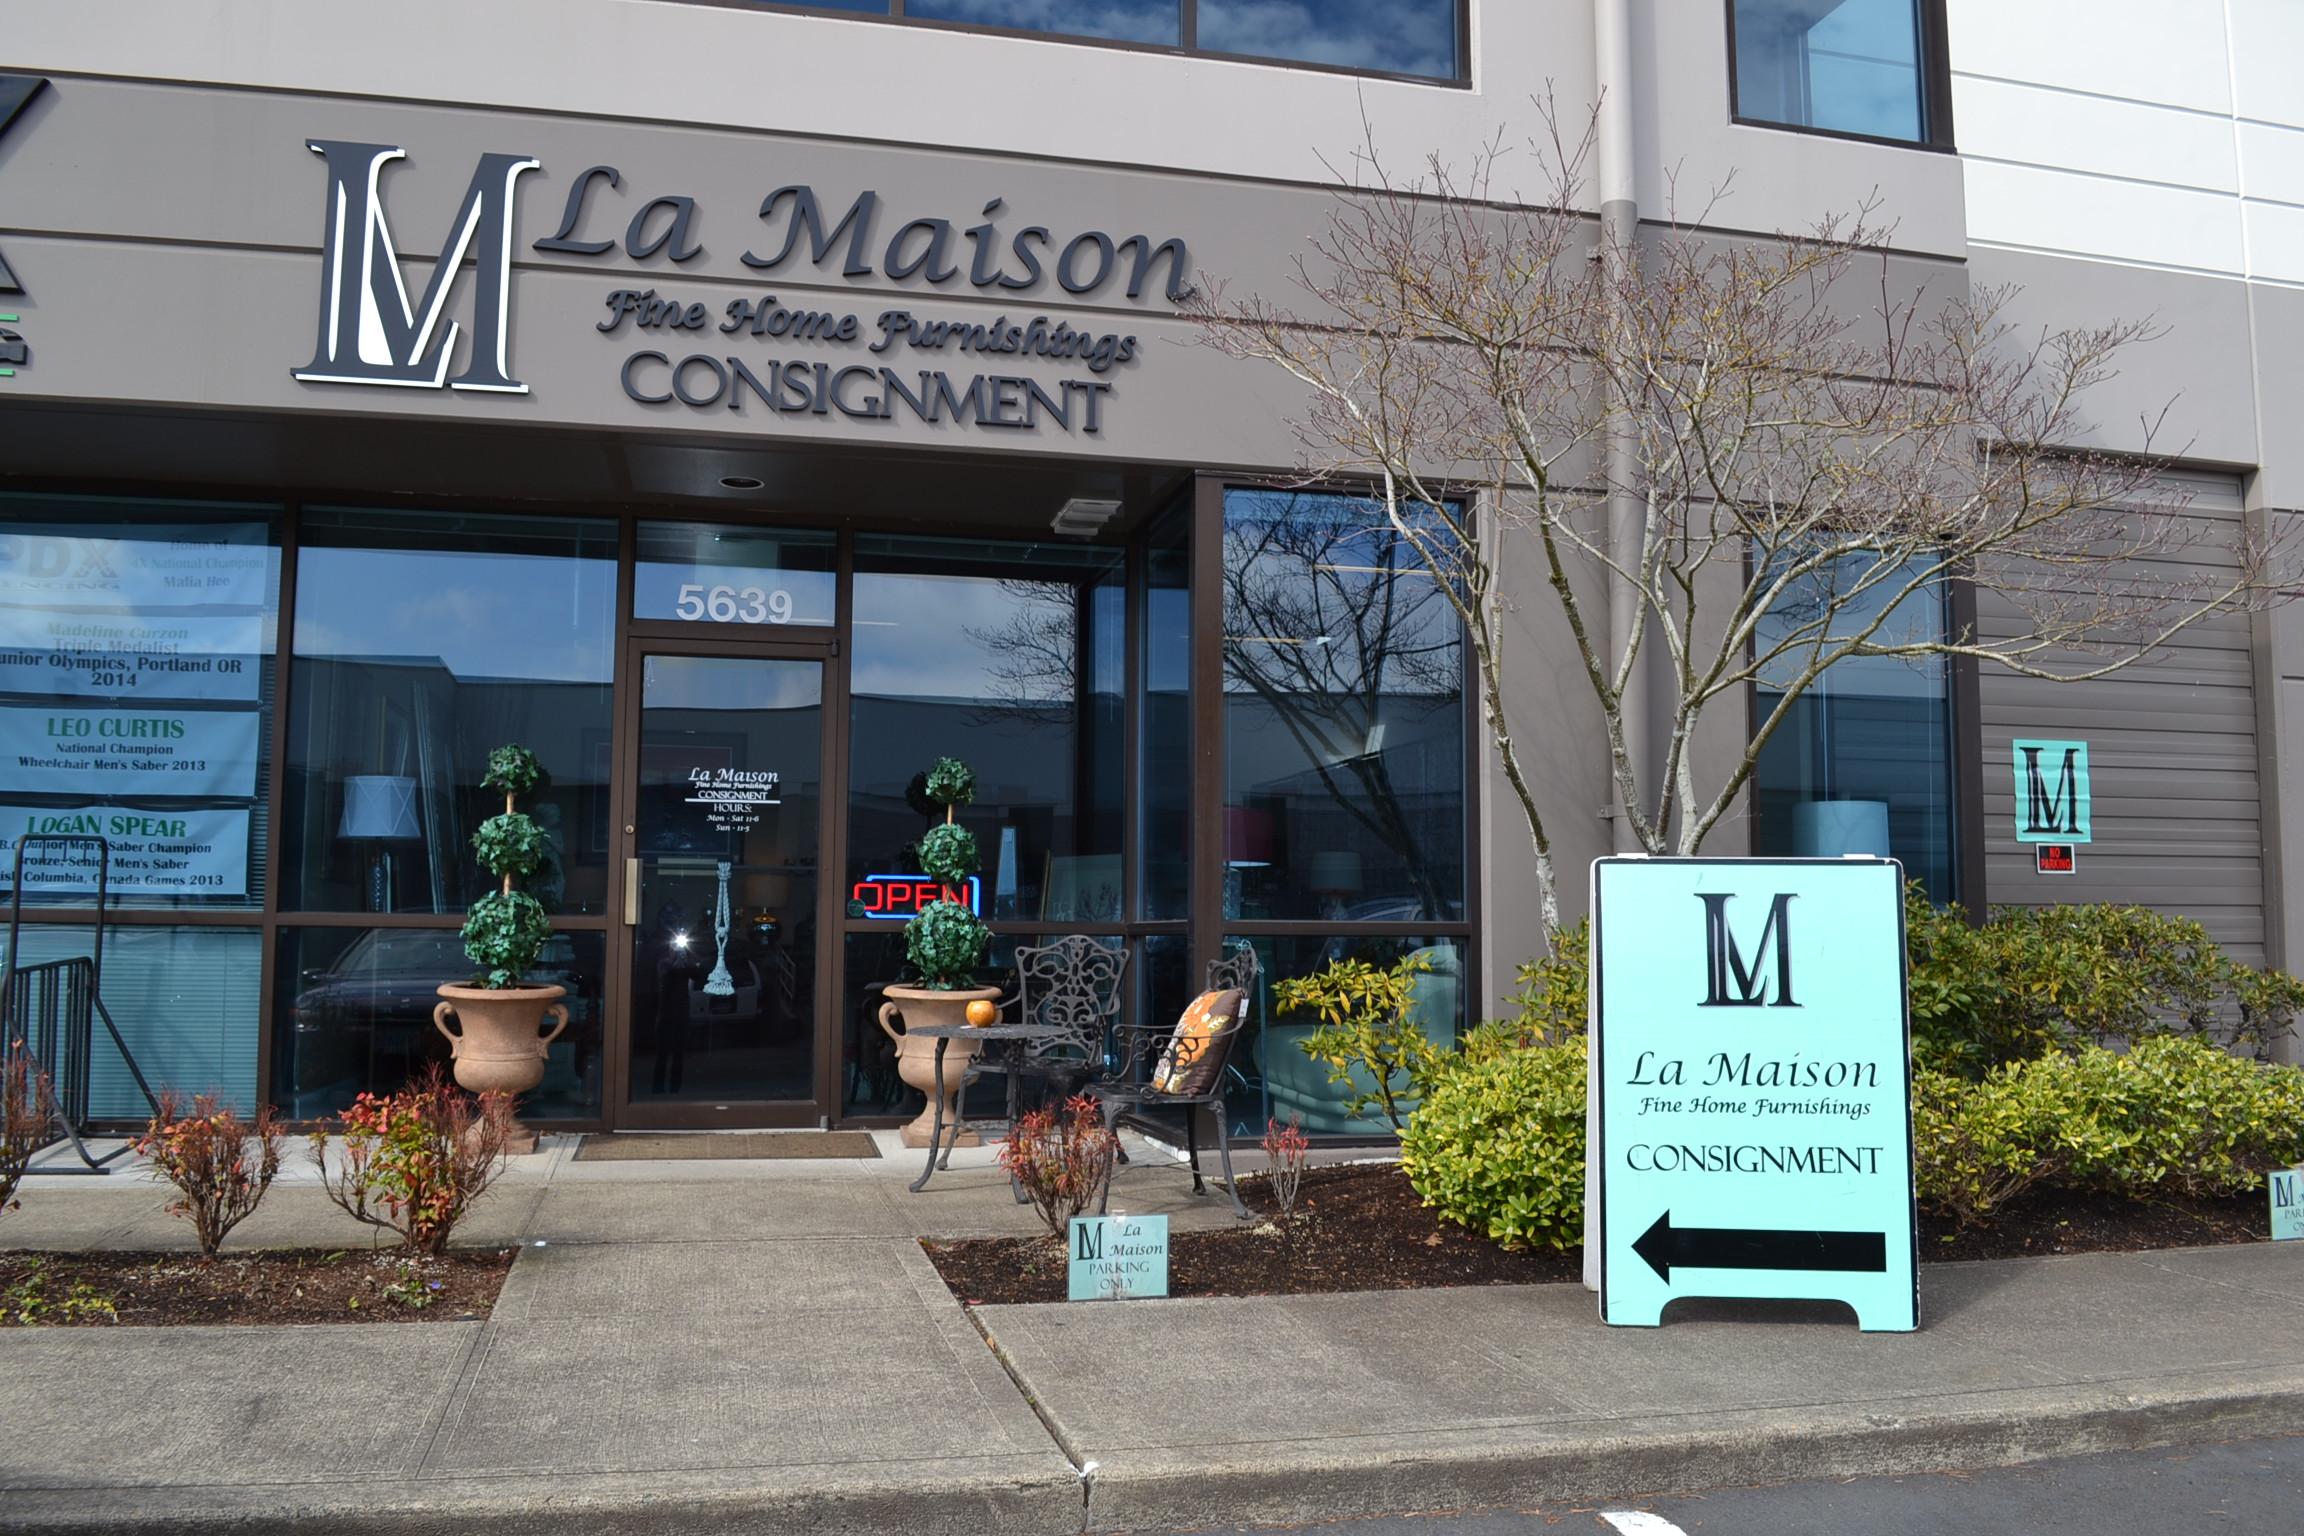 La Maison Fine Home Furnishings Consignment. Estate Sale Finder   Welcome